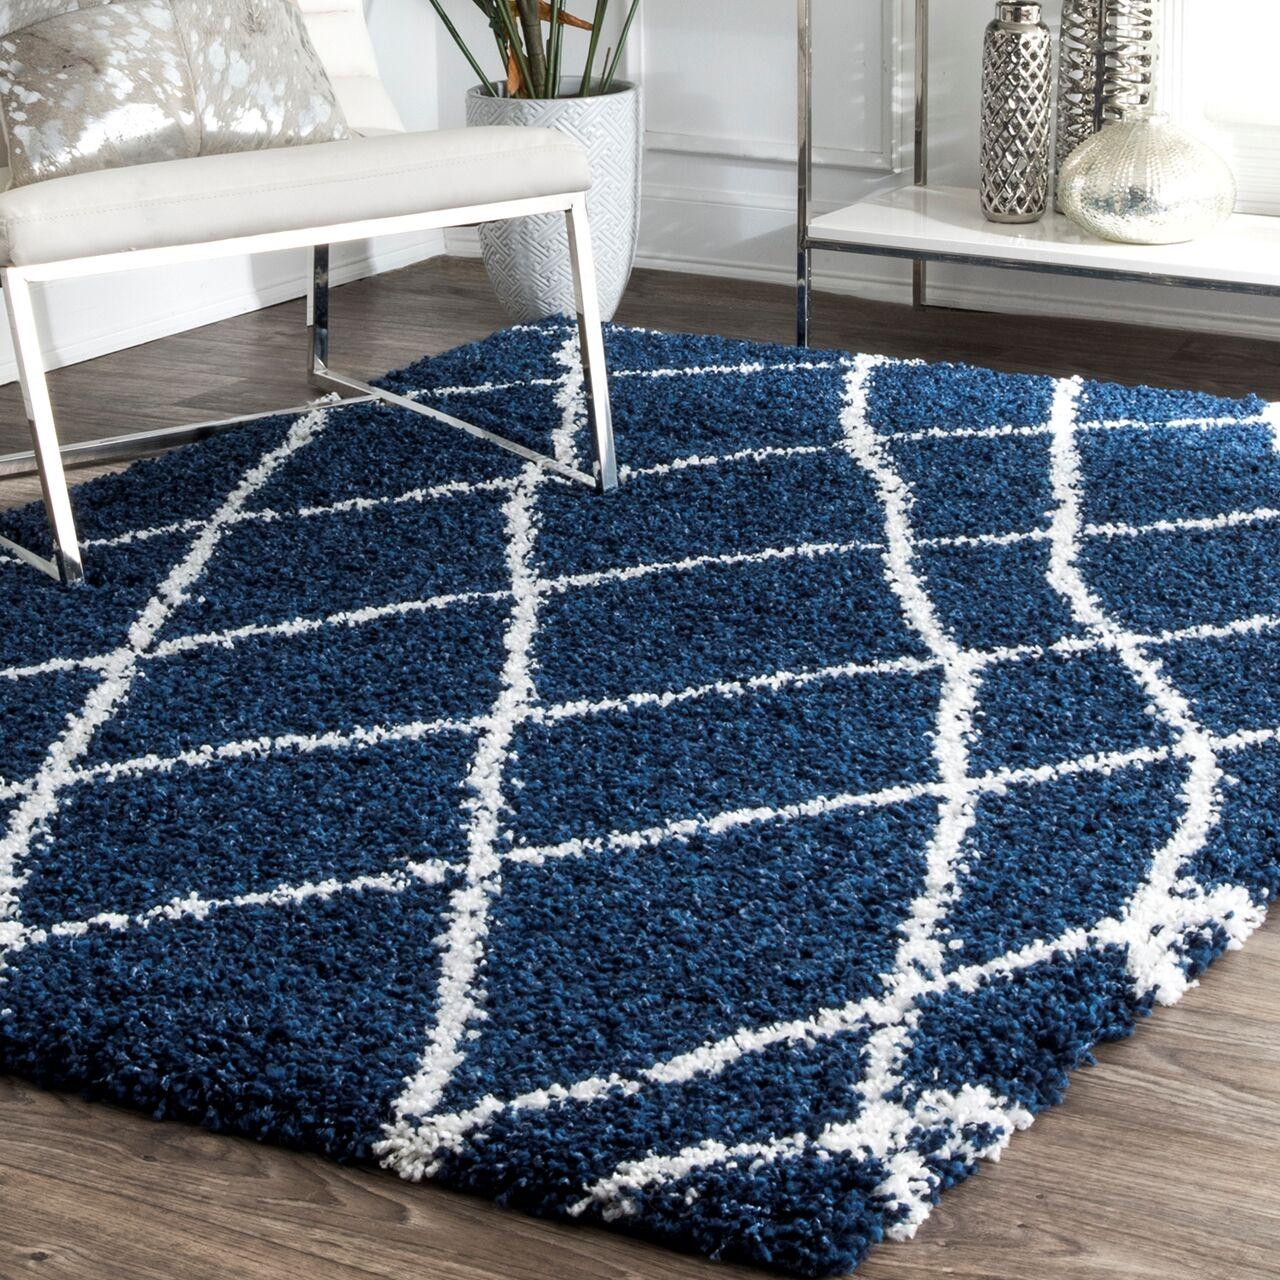 Hackett Blue Area Rug Rug Size: Rectangle 6'7'' x 9'